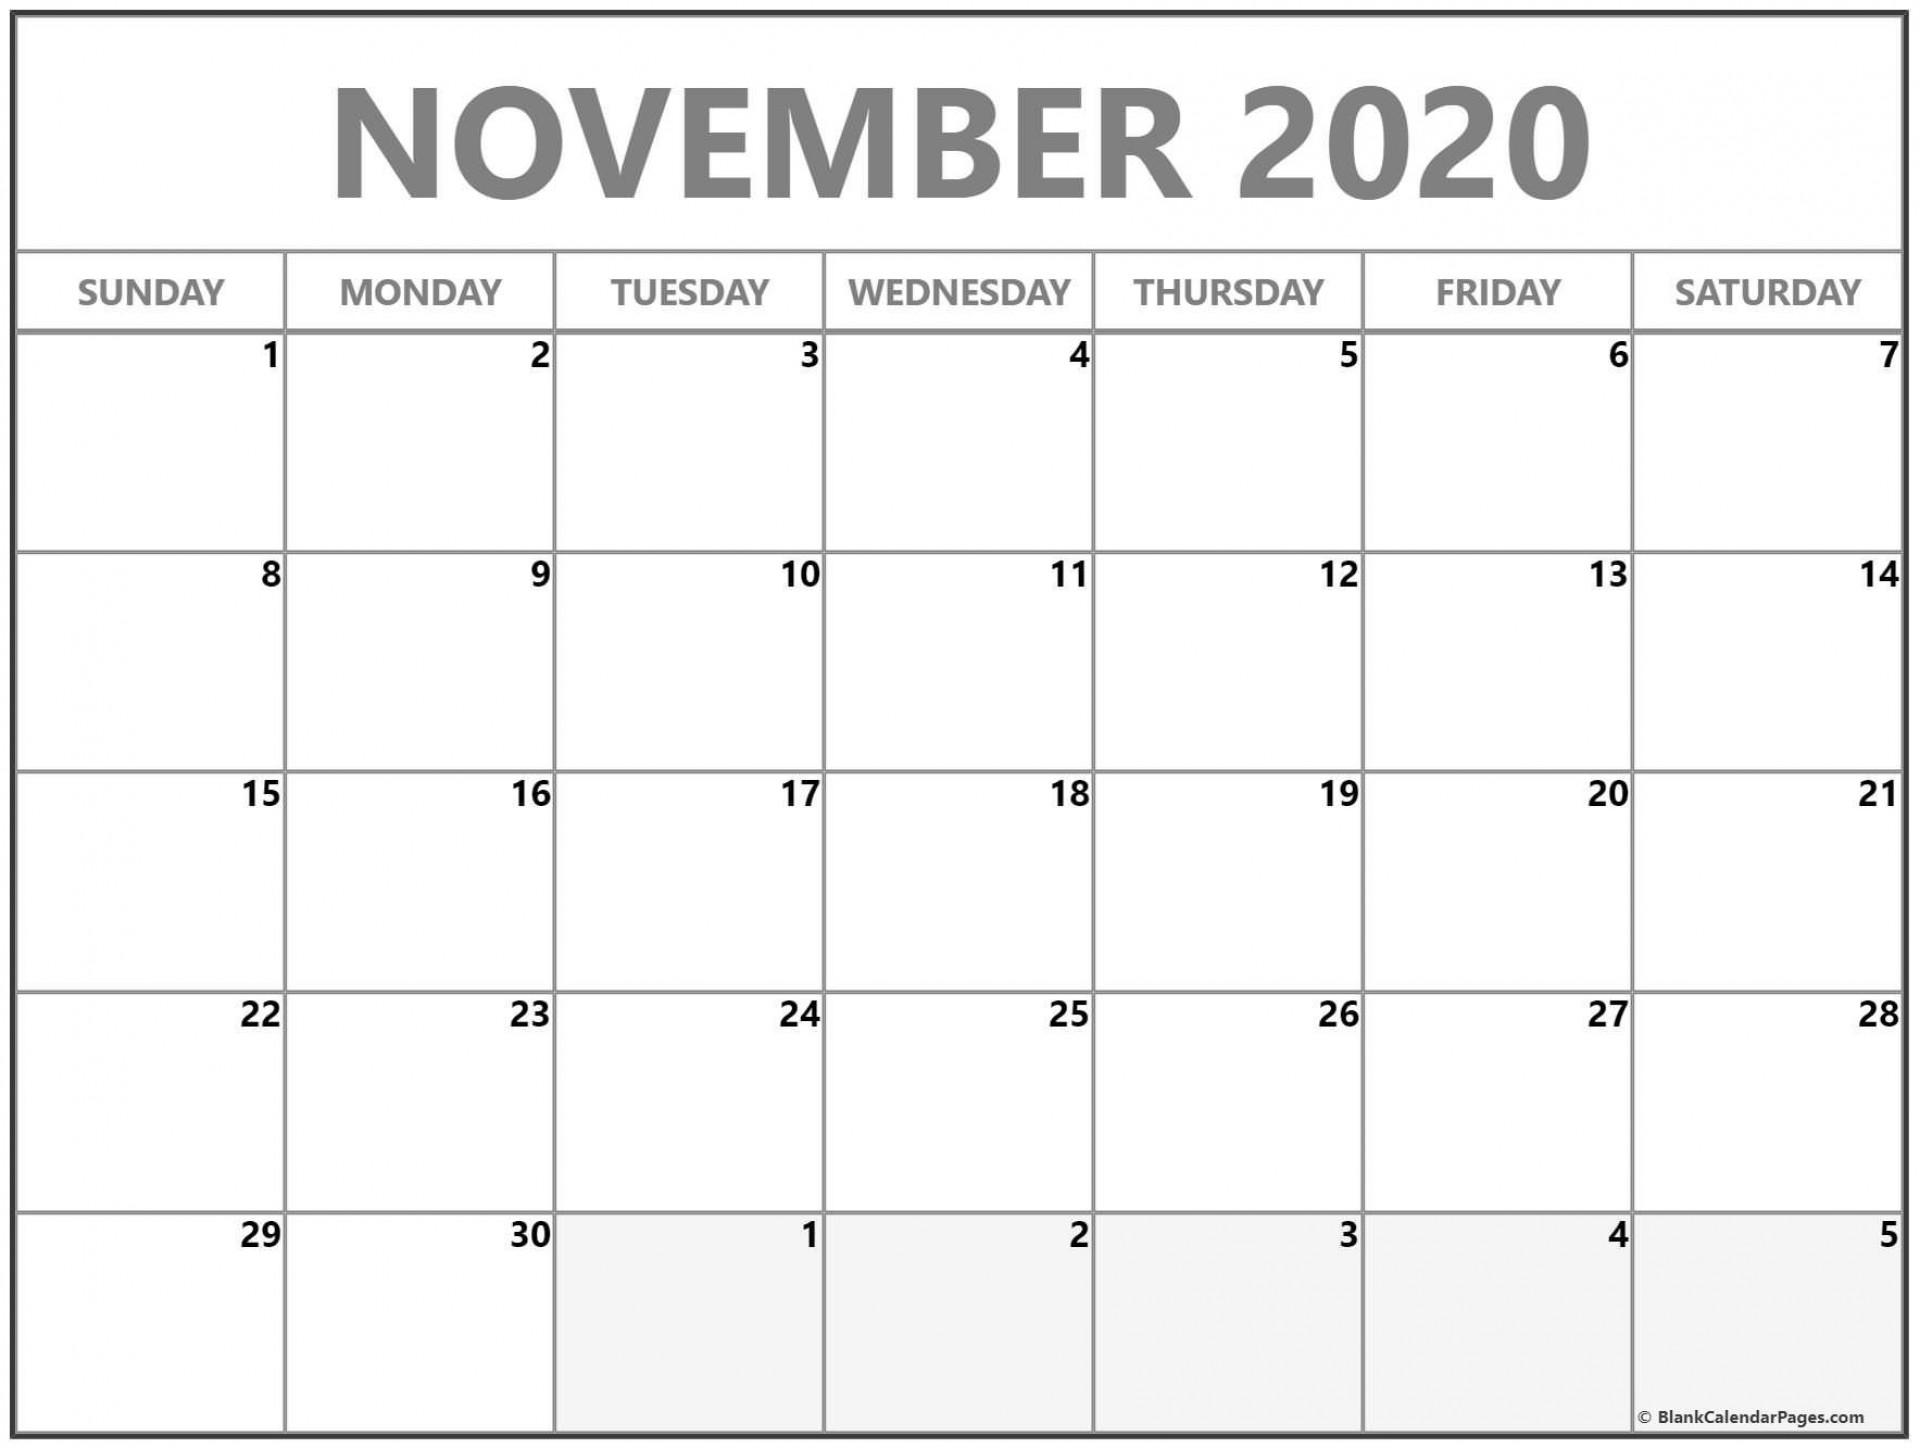 007 Awesome Printable Calendar Template November 2020 Photo  Free1920